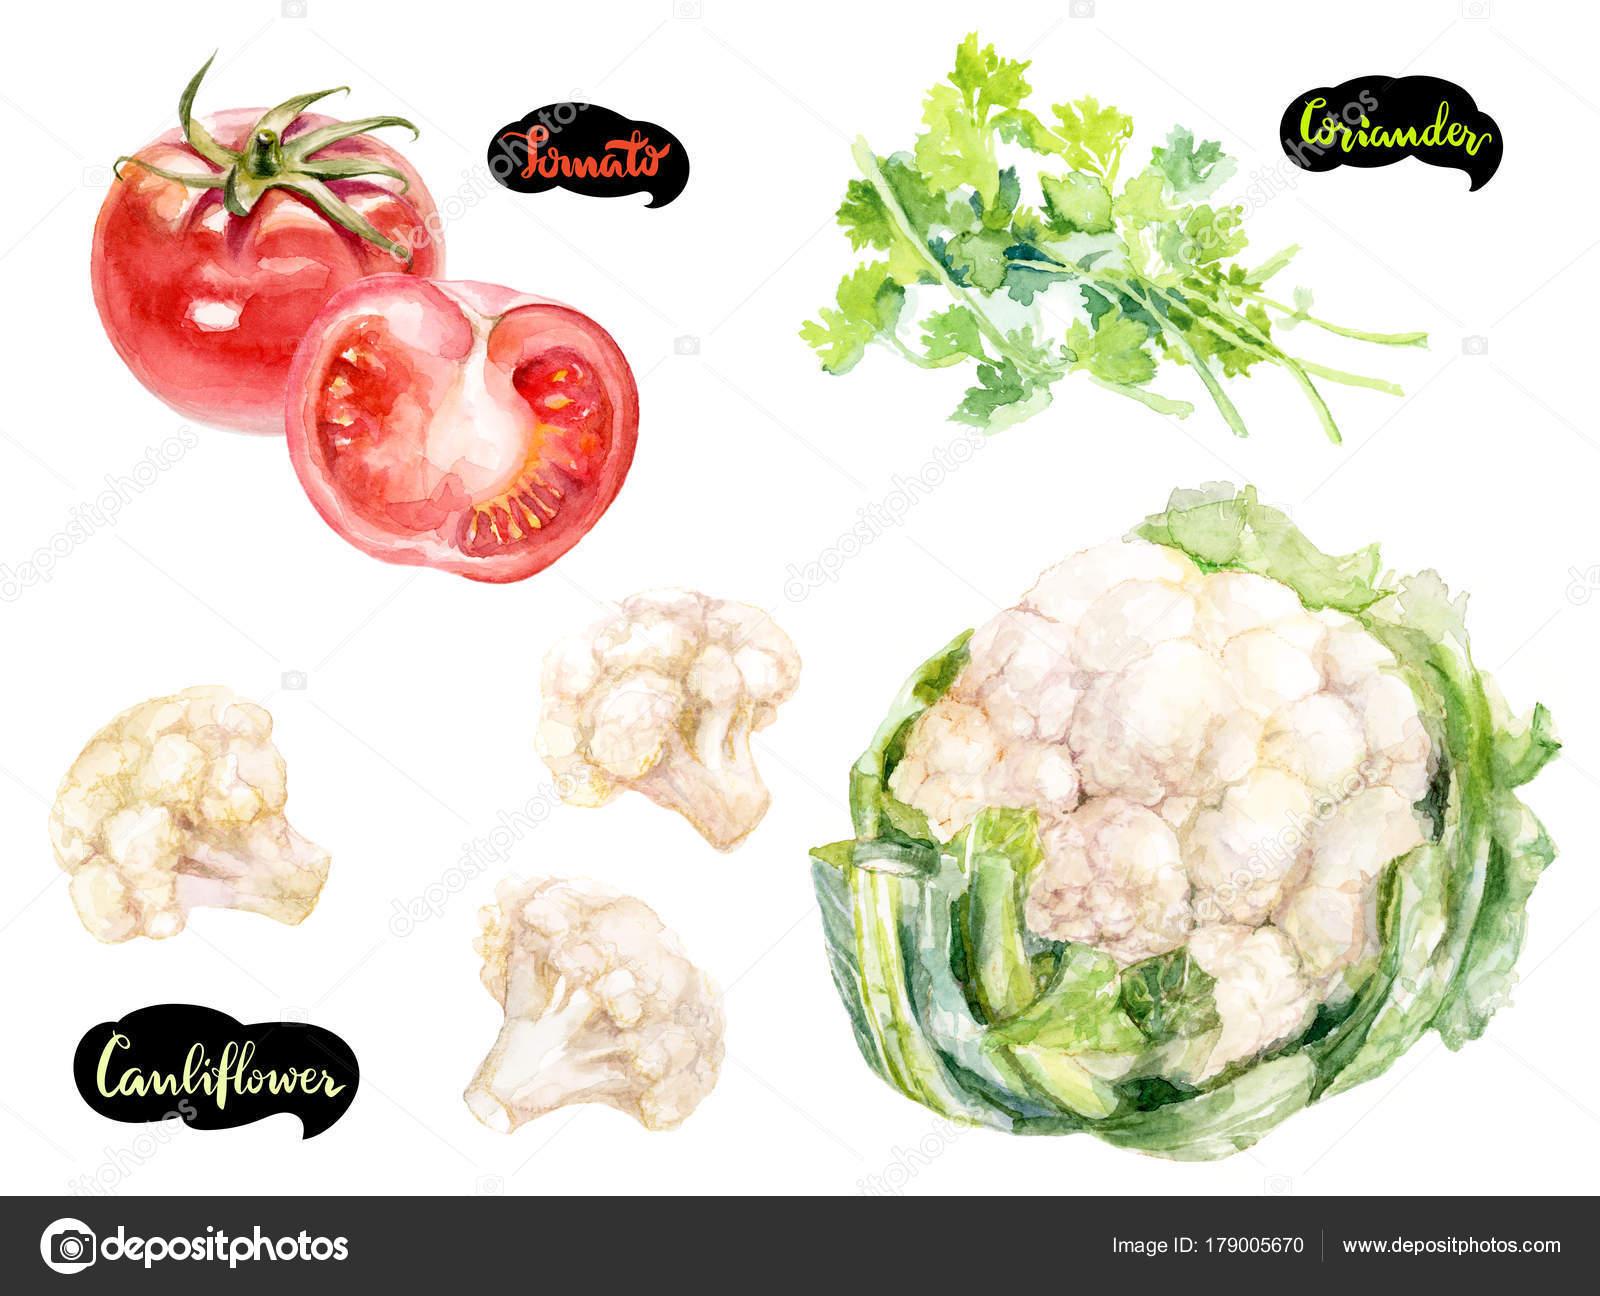 Herbs Spices Kitchen Watercolor Set Cauliflower Coriander Tomatoes ...